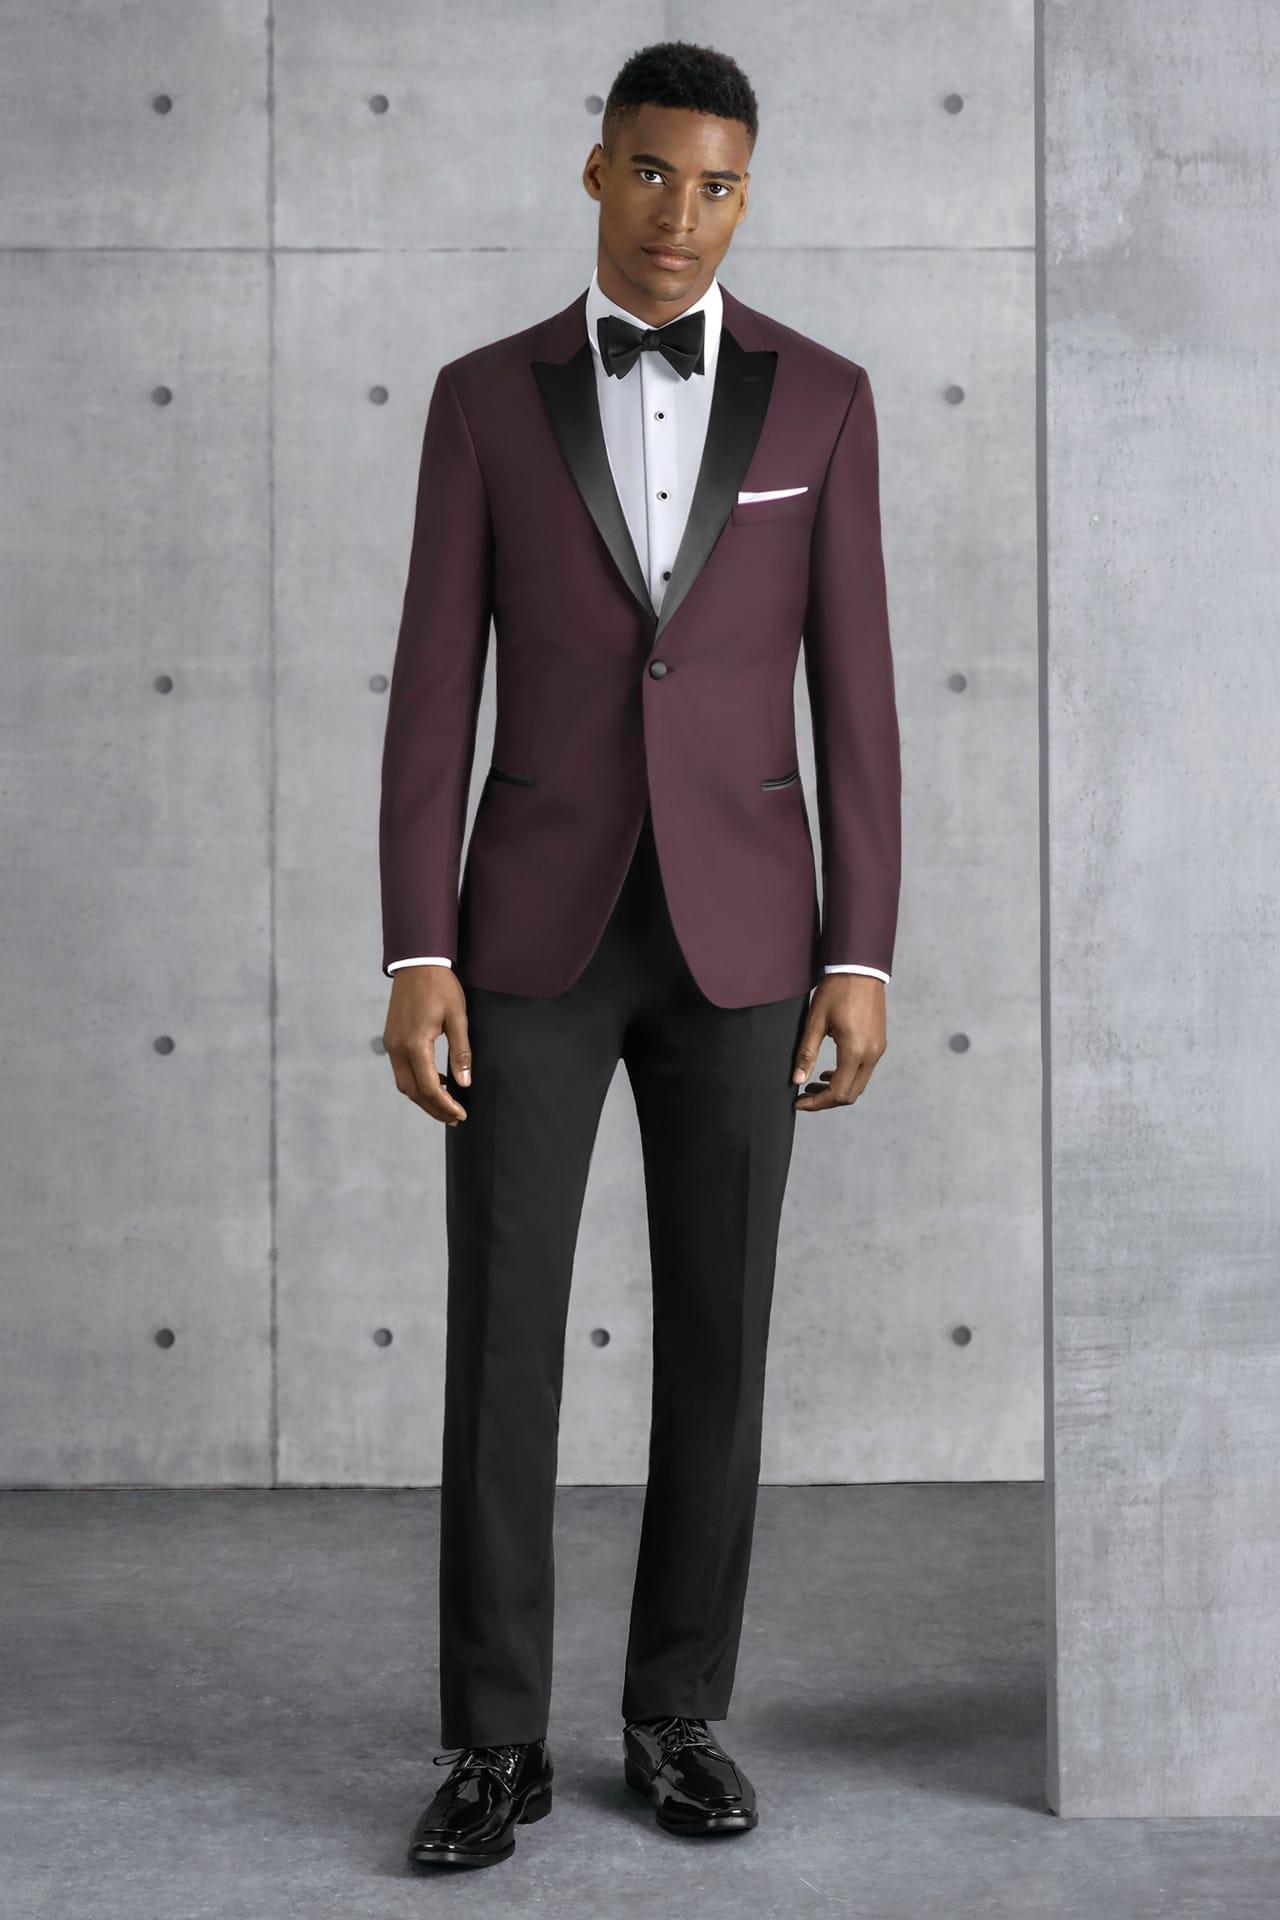 Ultra Slim Burgundy Empire Kenneth Cole Tuxedo